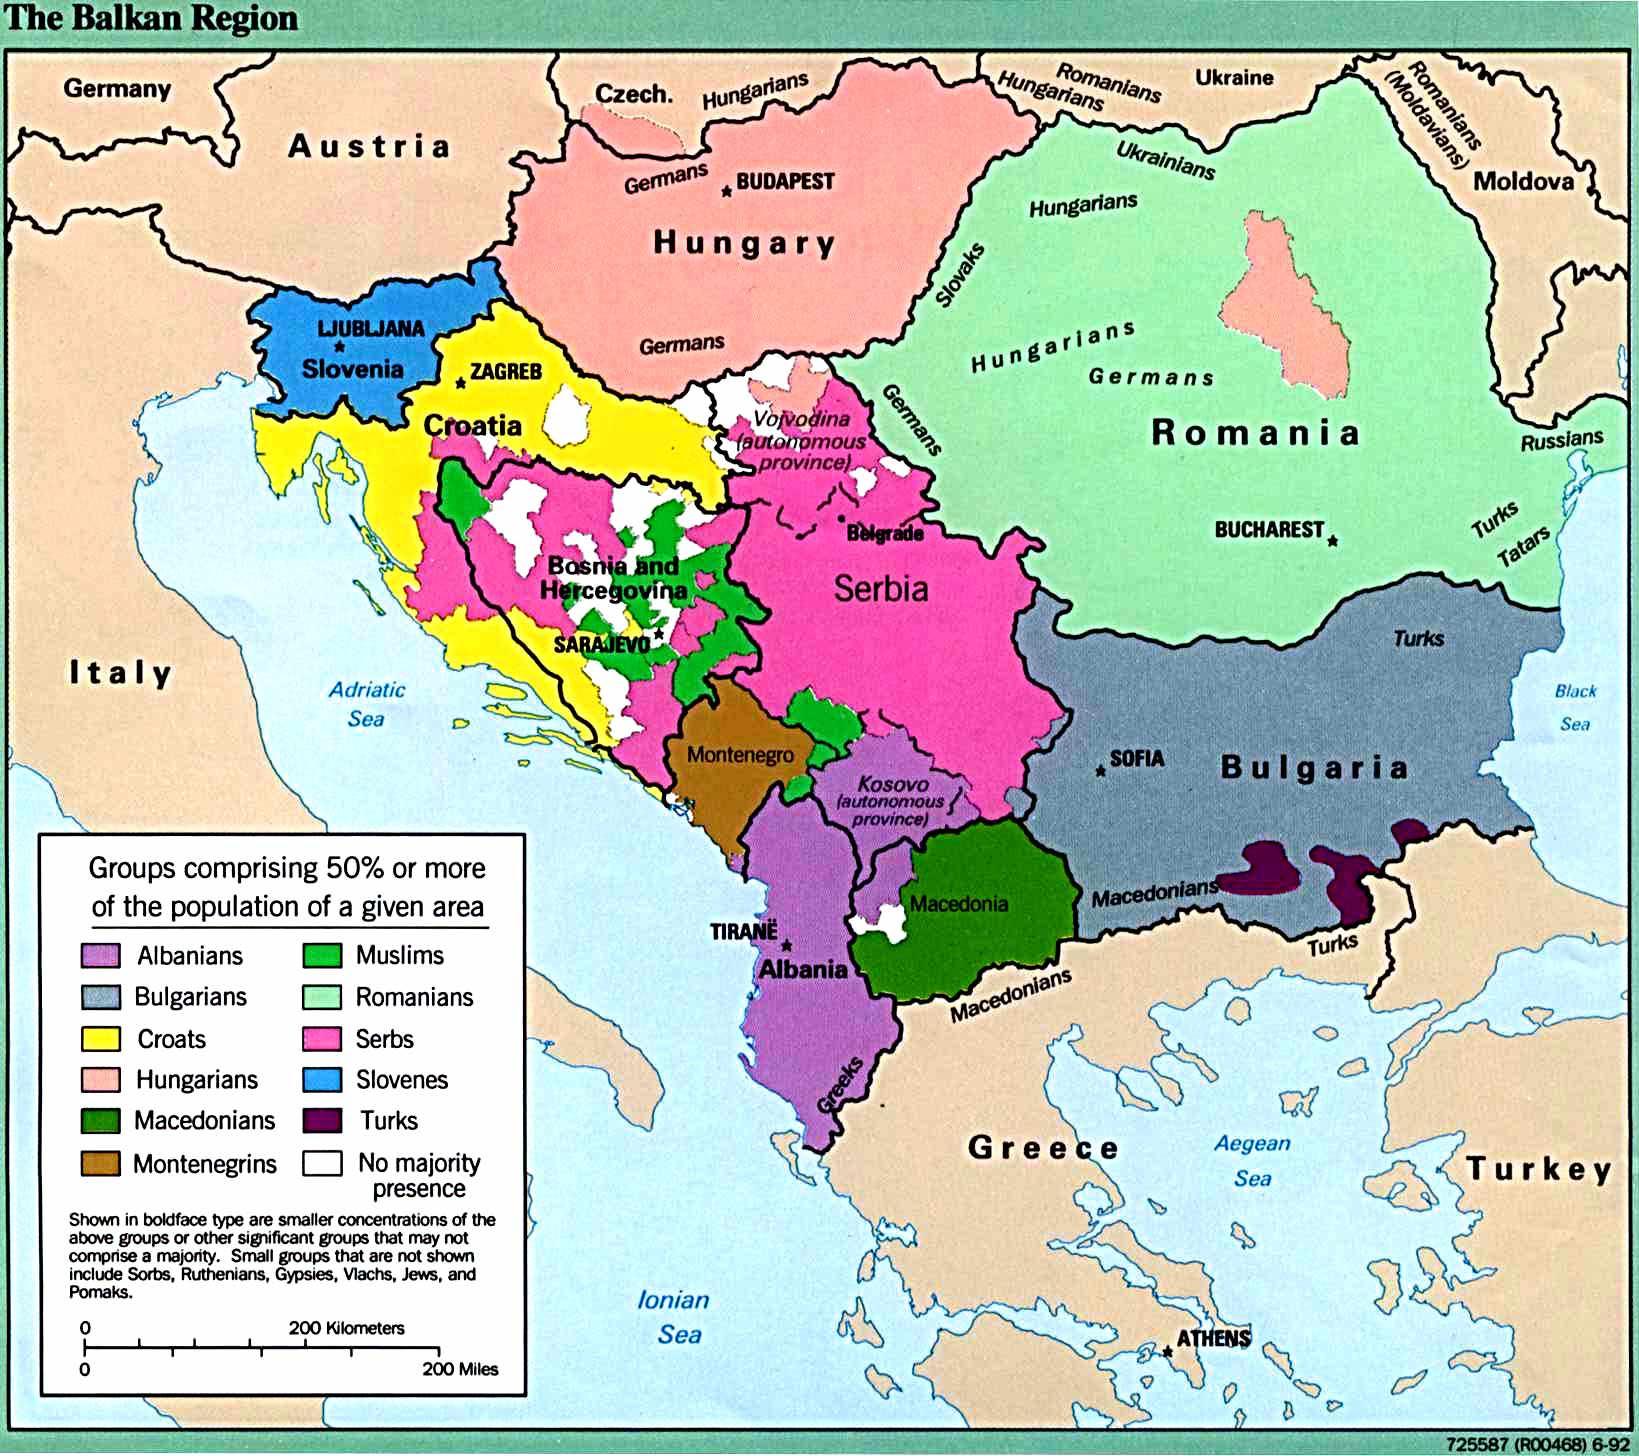 http://www.makedonija.info/CIA_Balkans.jpg